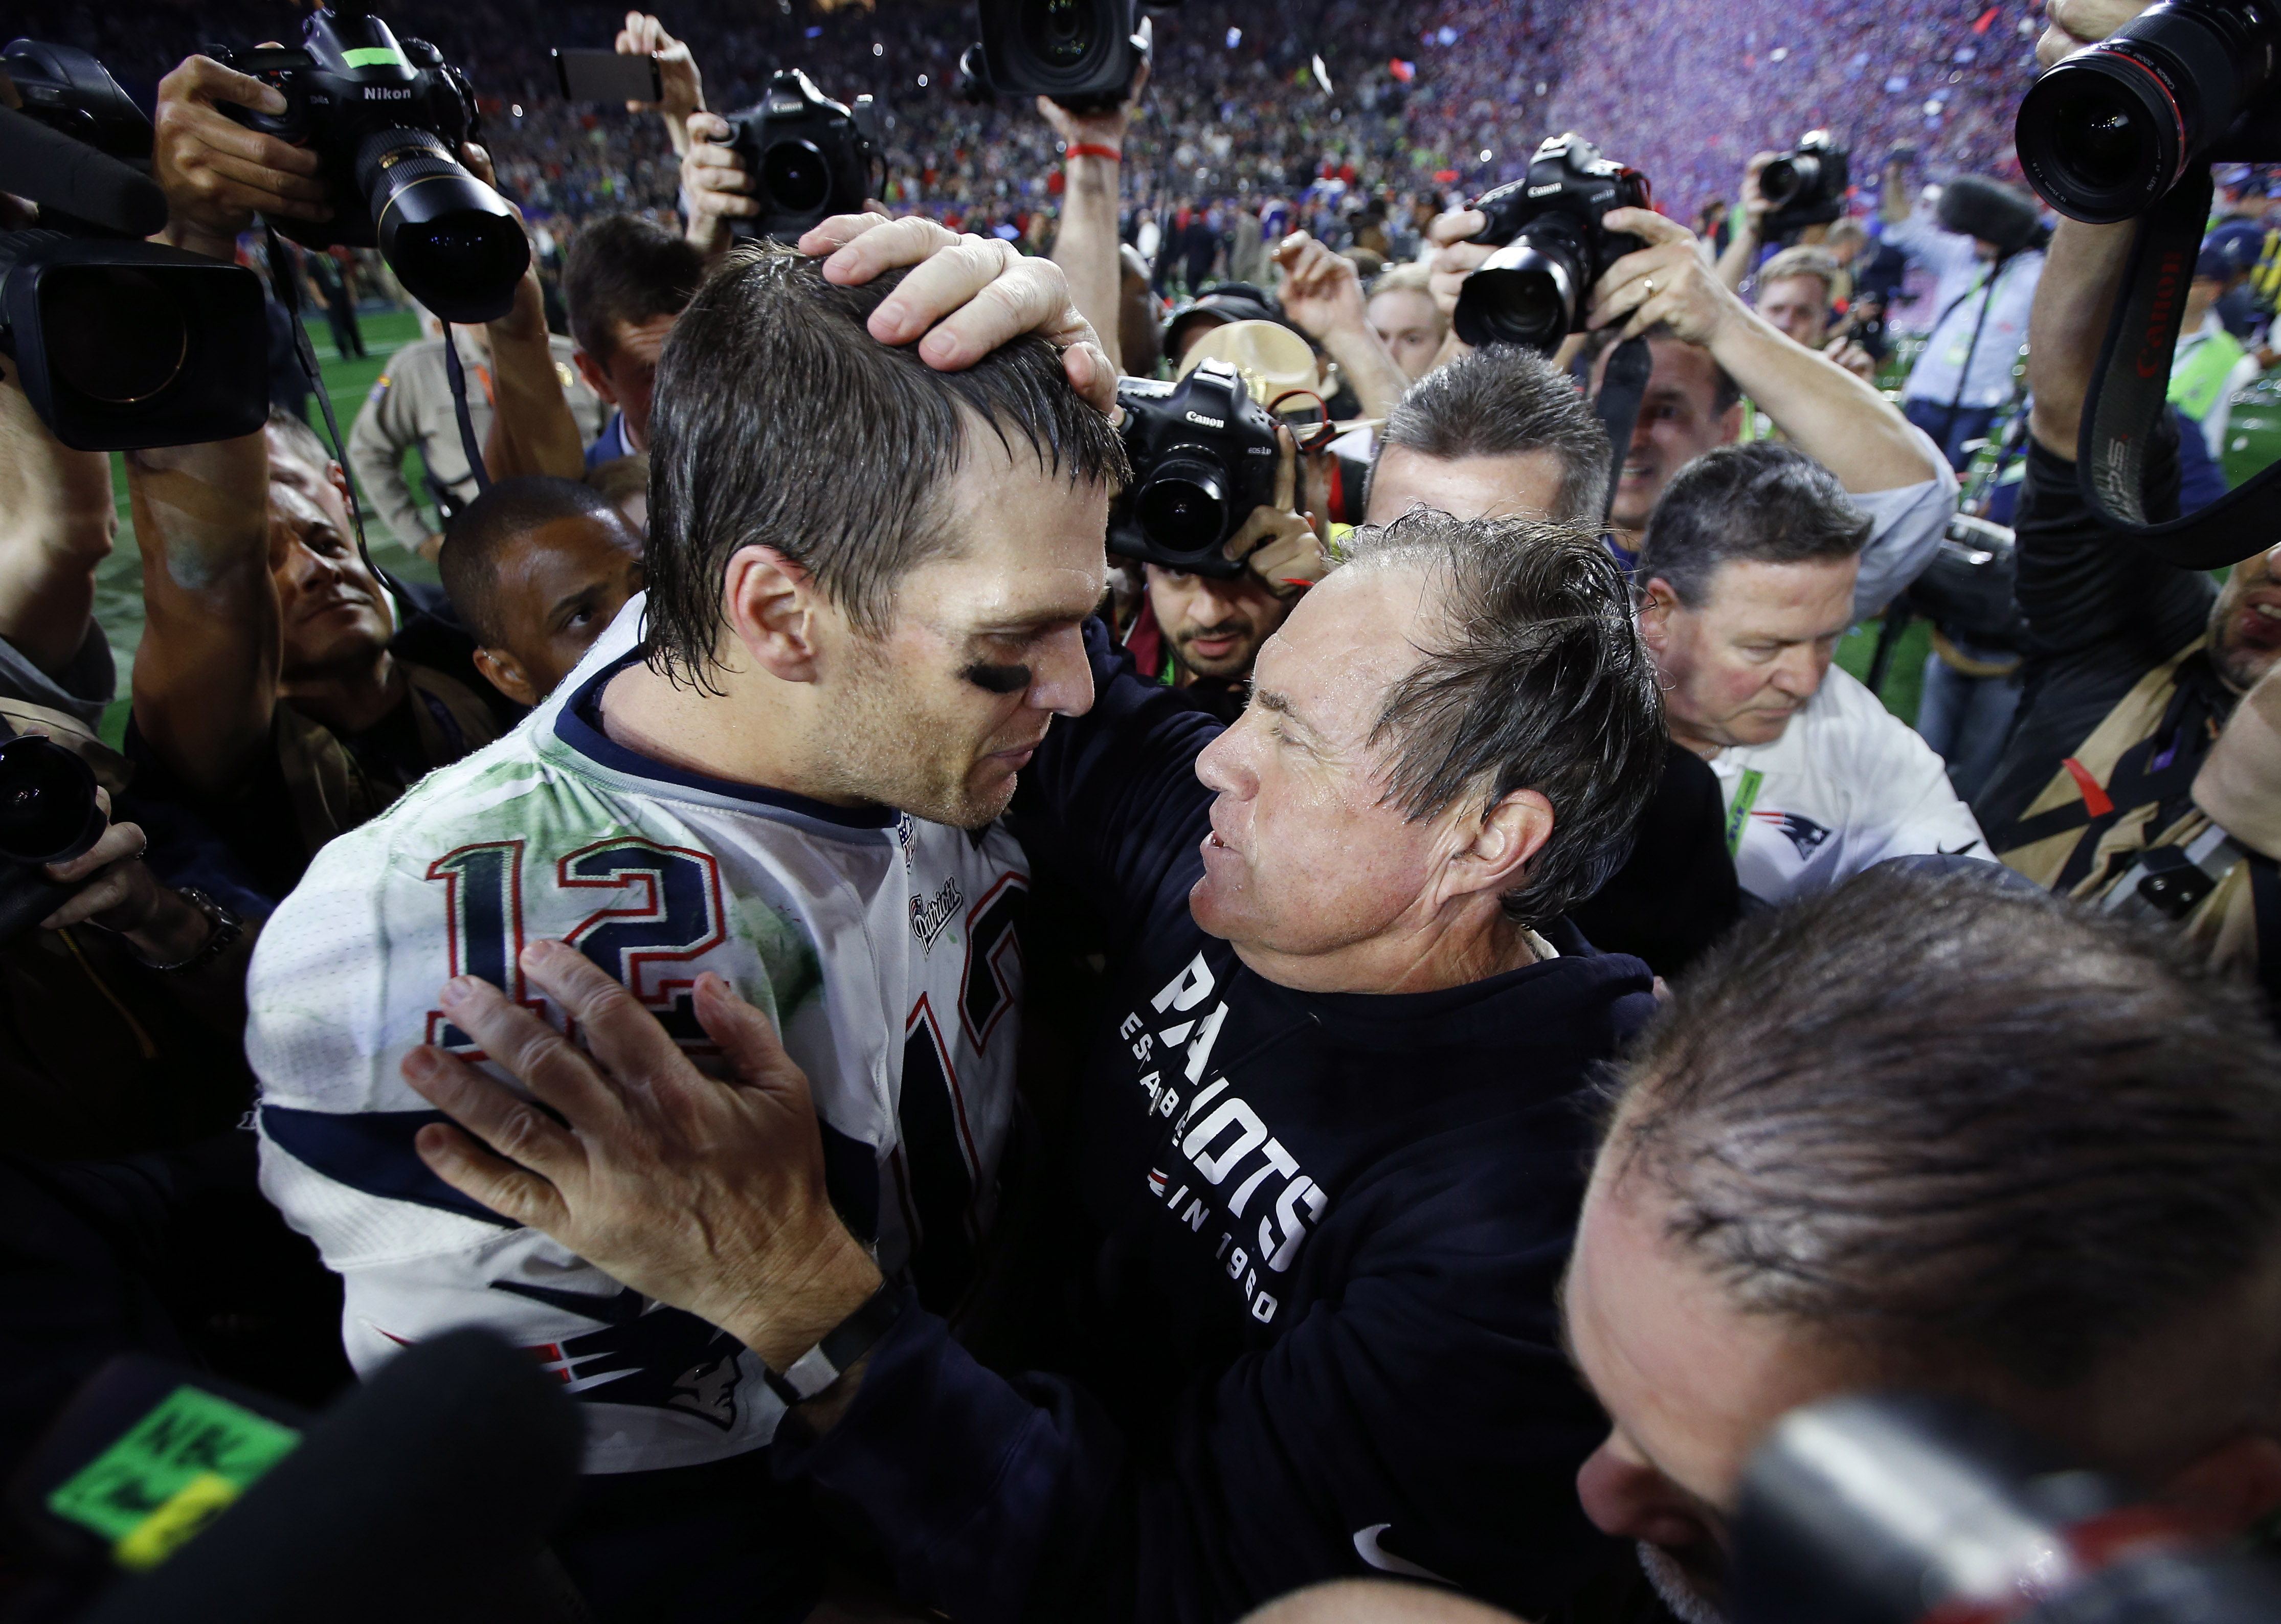 Tom Brady and Bill Belichick following the Super Bowl win in February